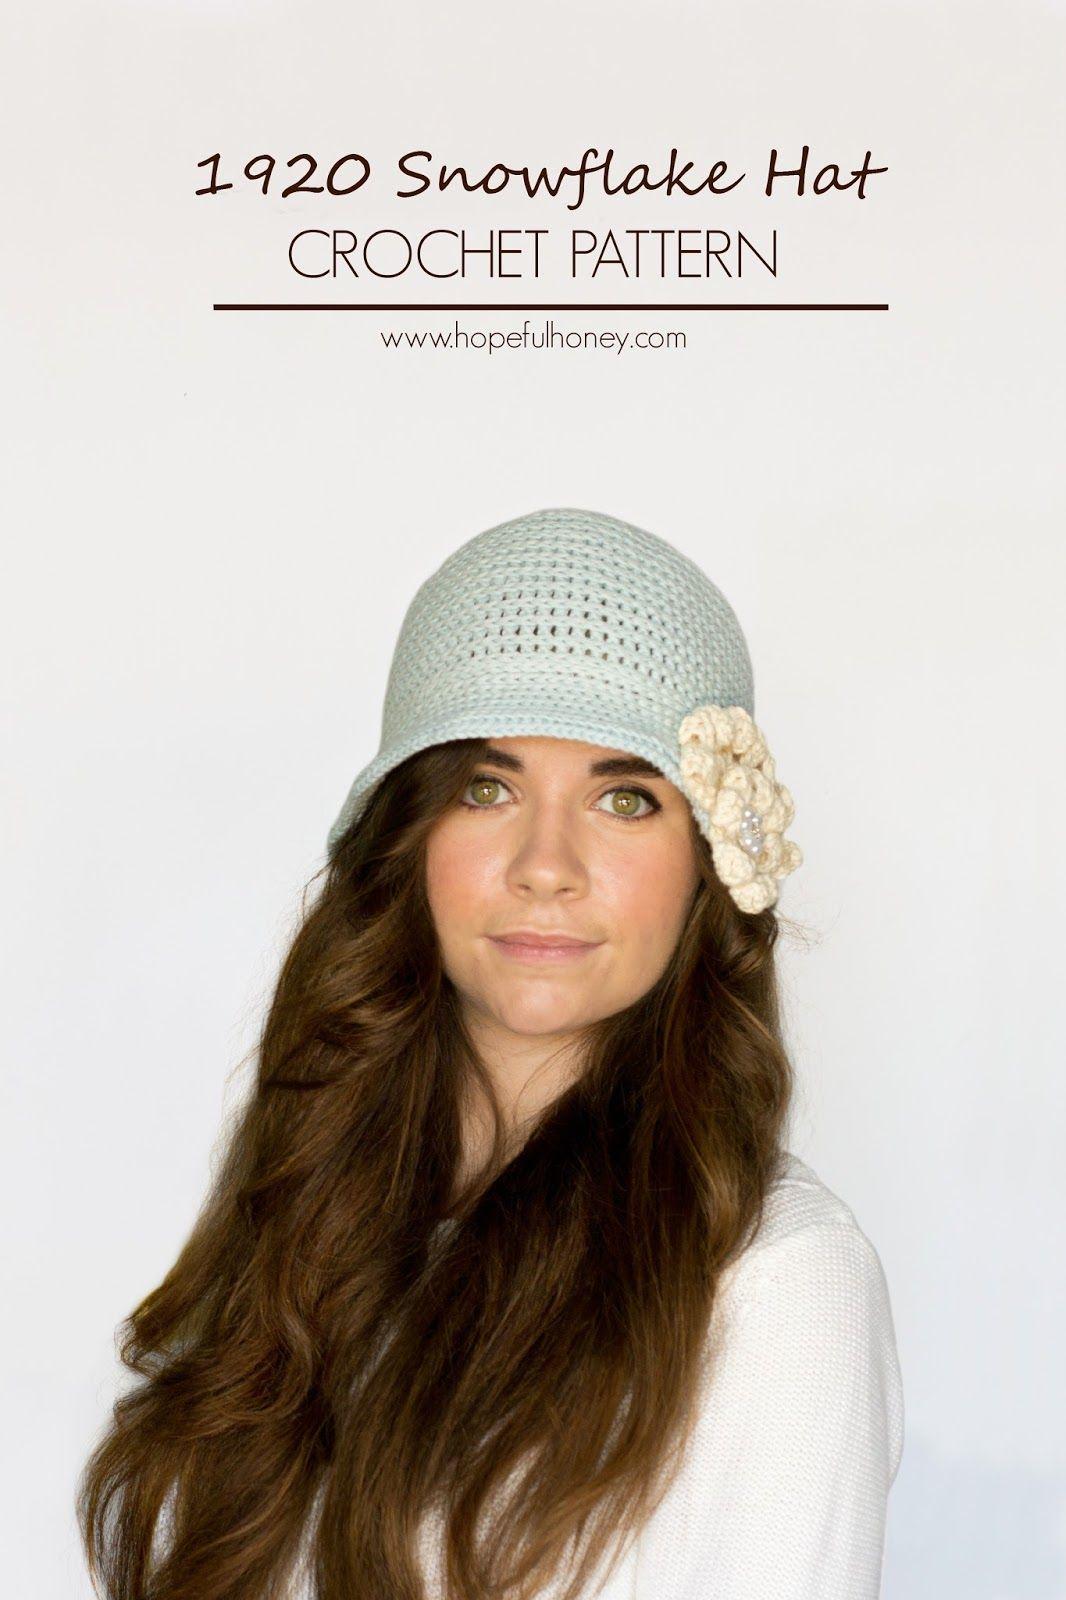 100 Best Crochet Hat Patterns For All Ages | Crochet Hats ...